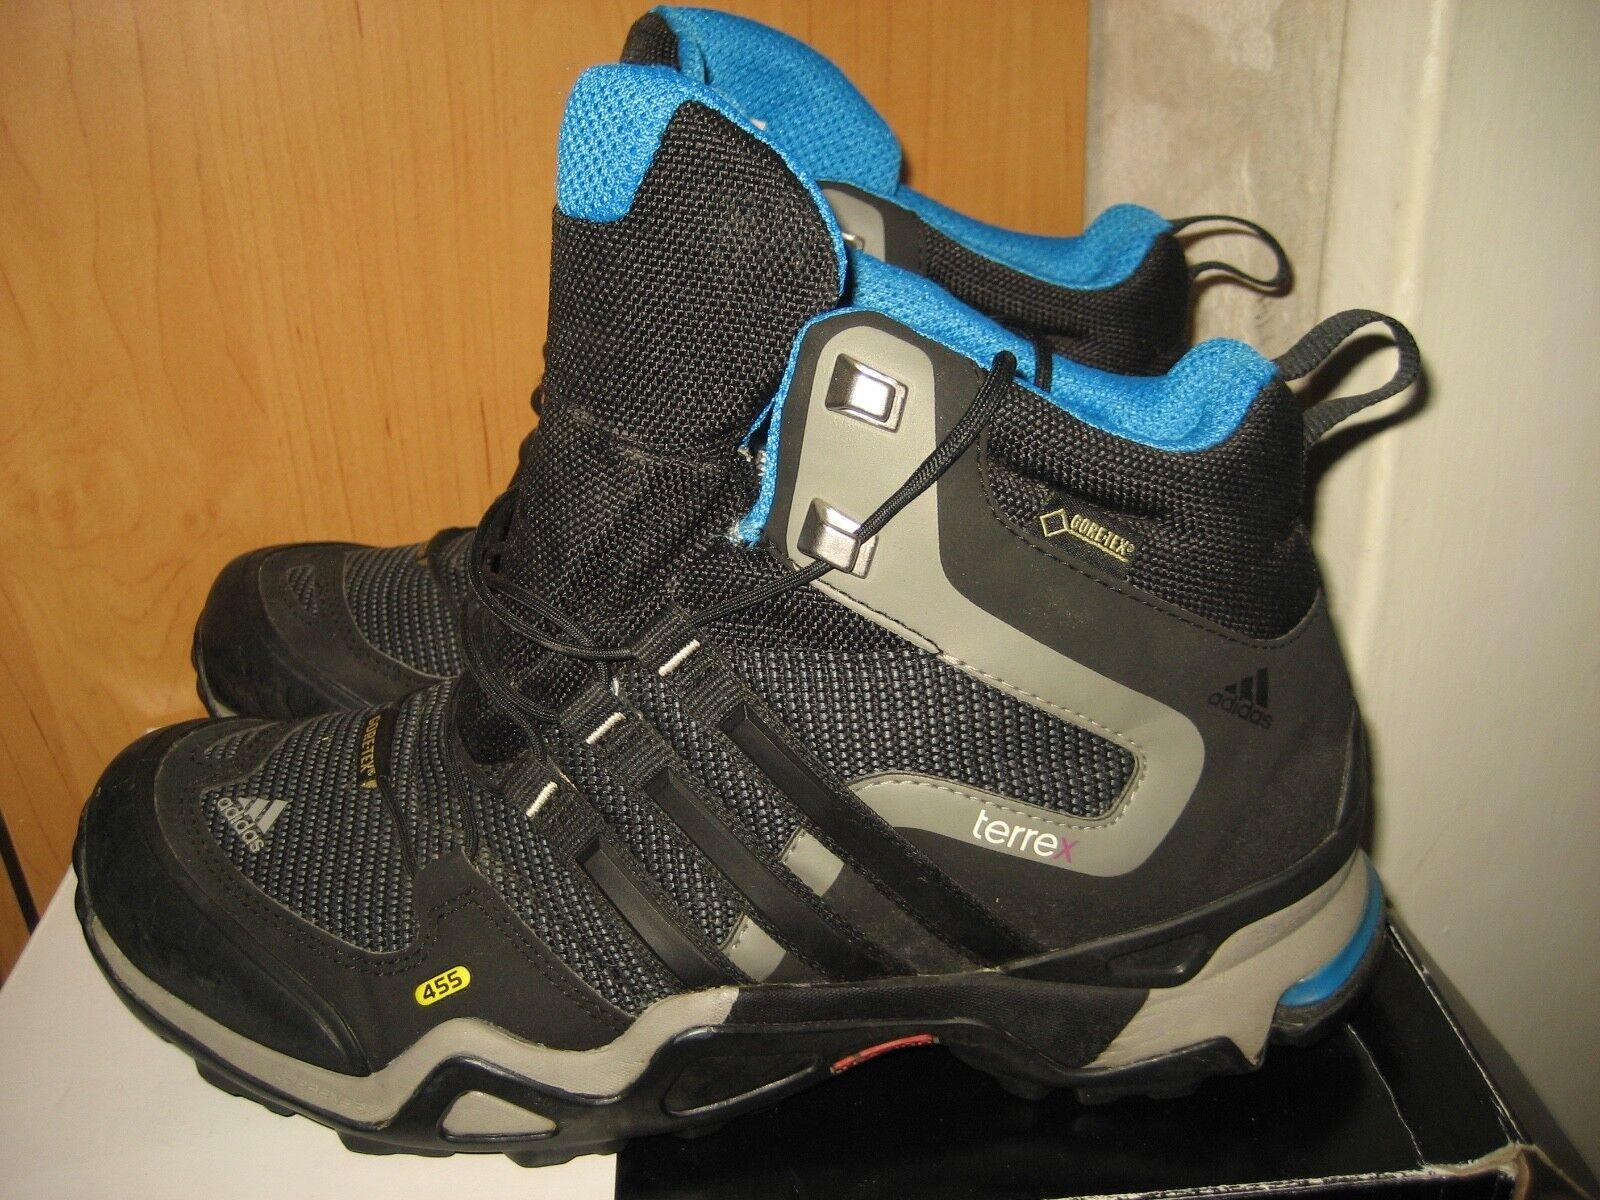 Adidas Terrex Conrax  Continental   Stiefel Schuhe Winterschuhe wie NEU ..